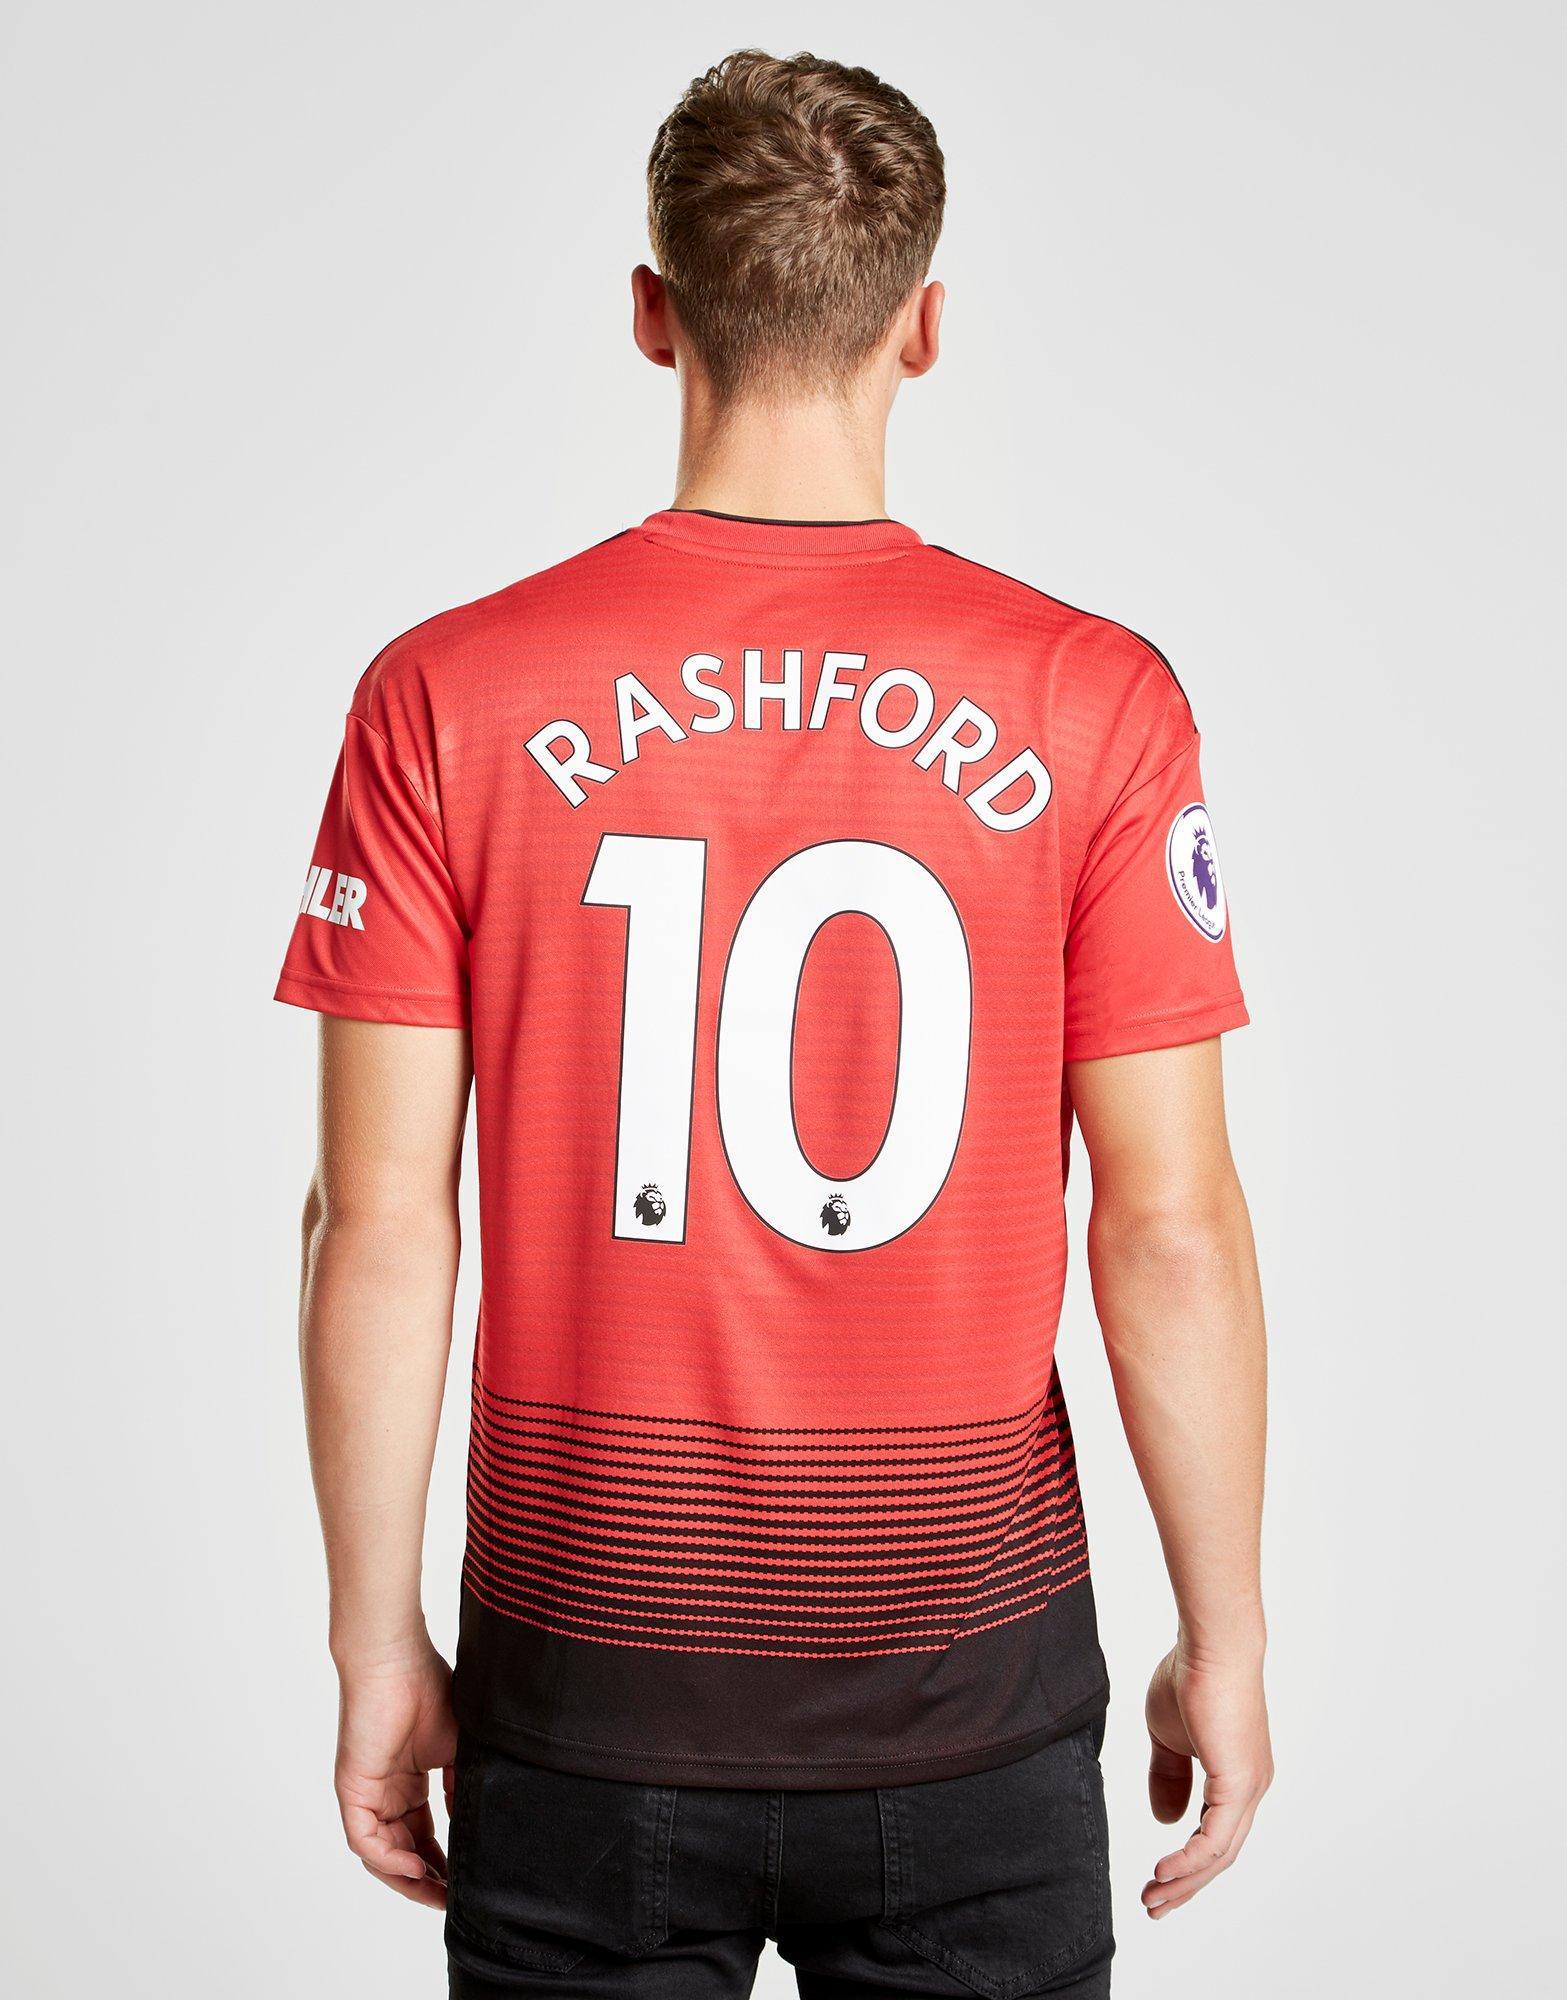 best loved 060d5 07841 Adidas Red Manchester United 2018/19 Rashford #10 Home Shirt for men